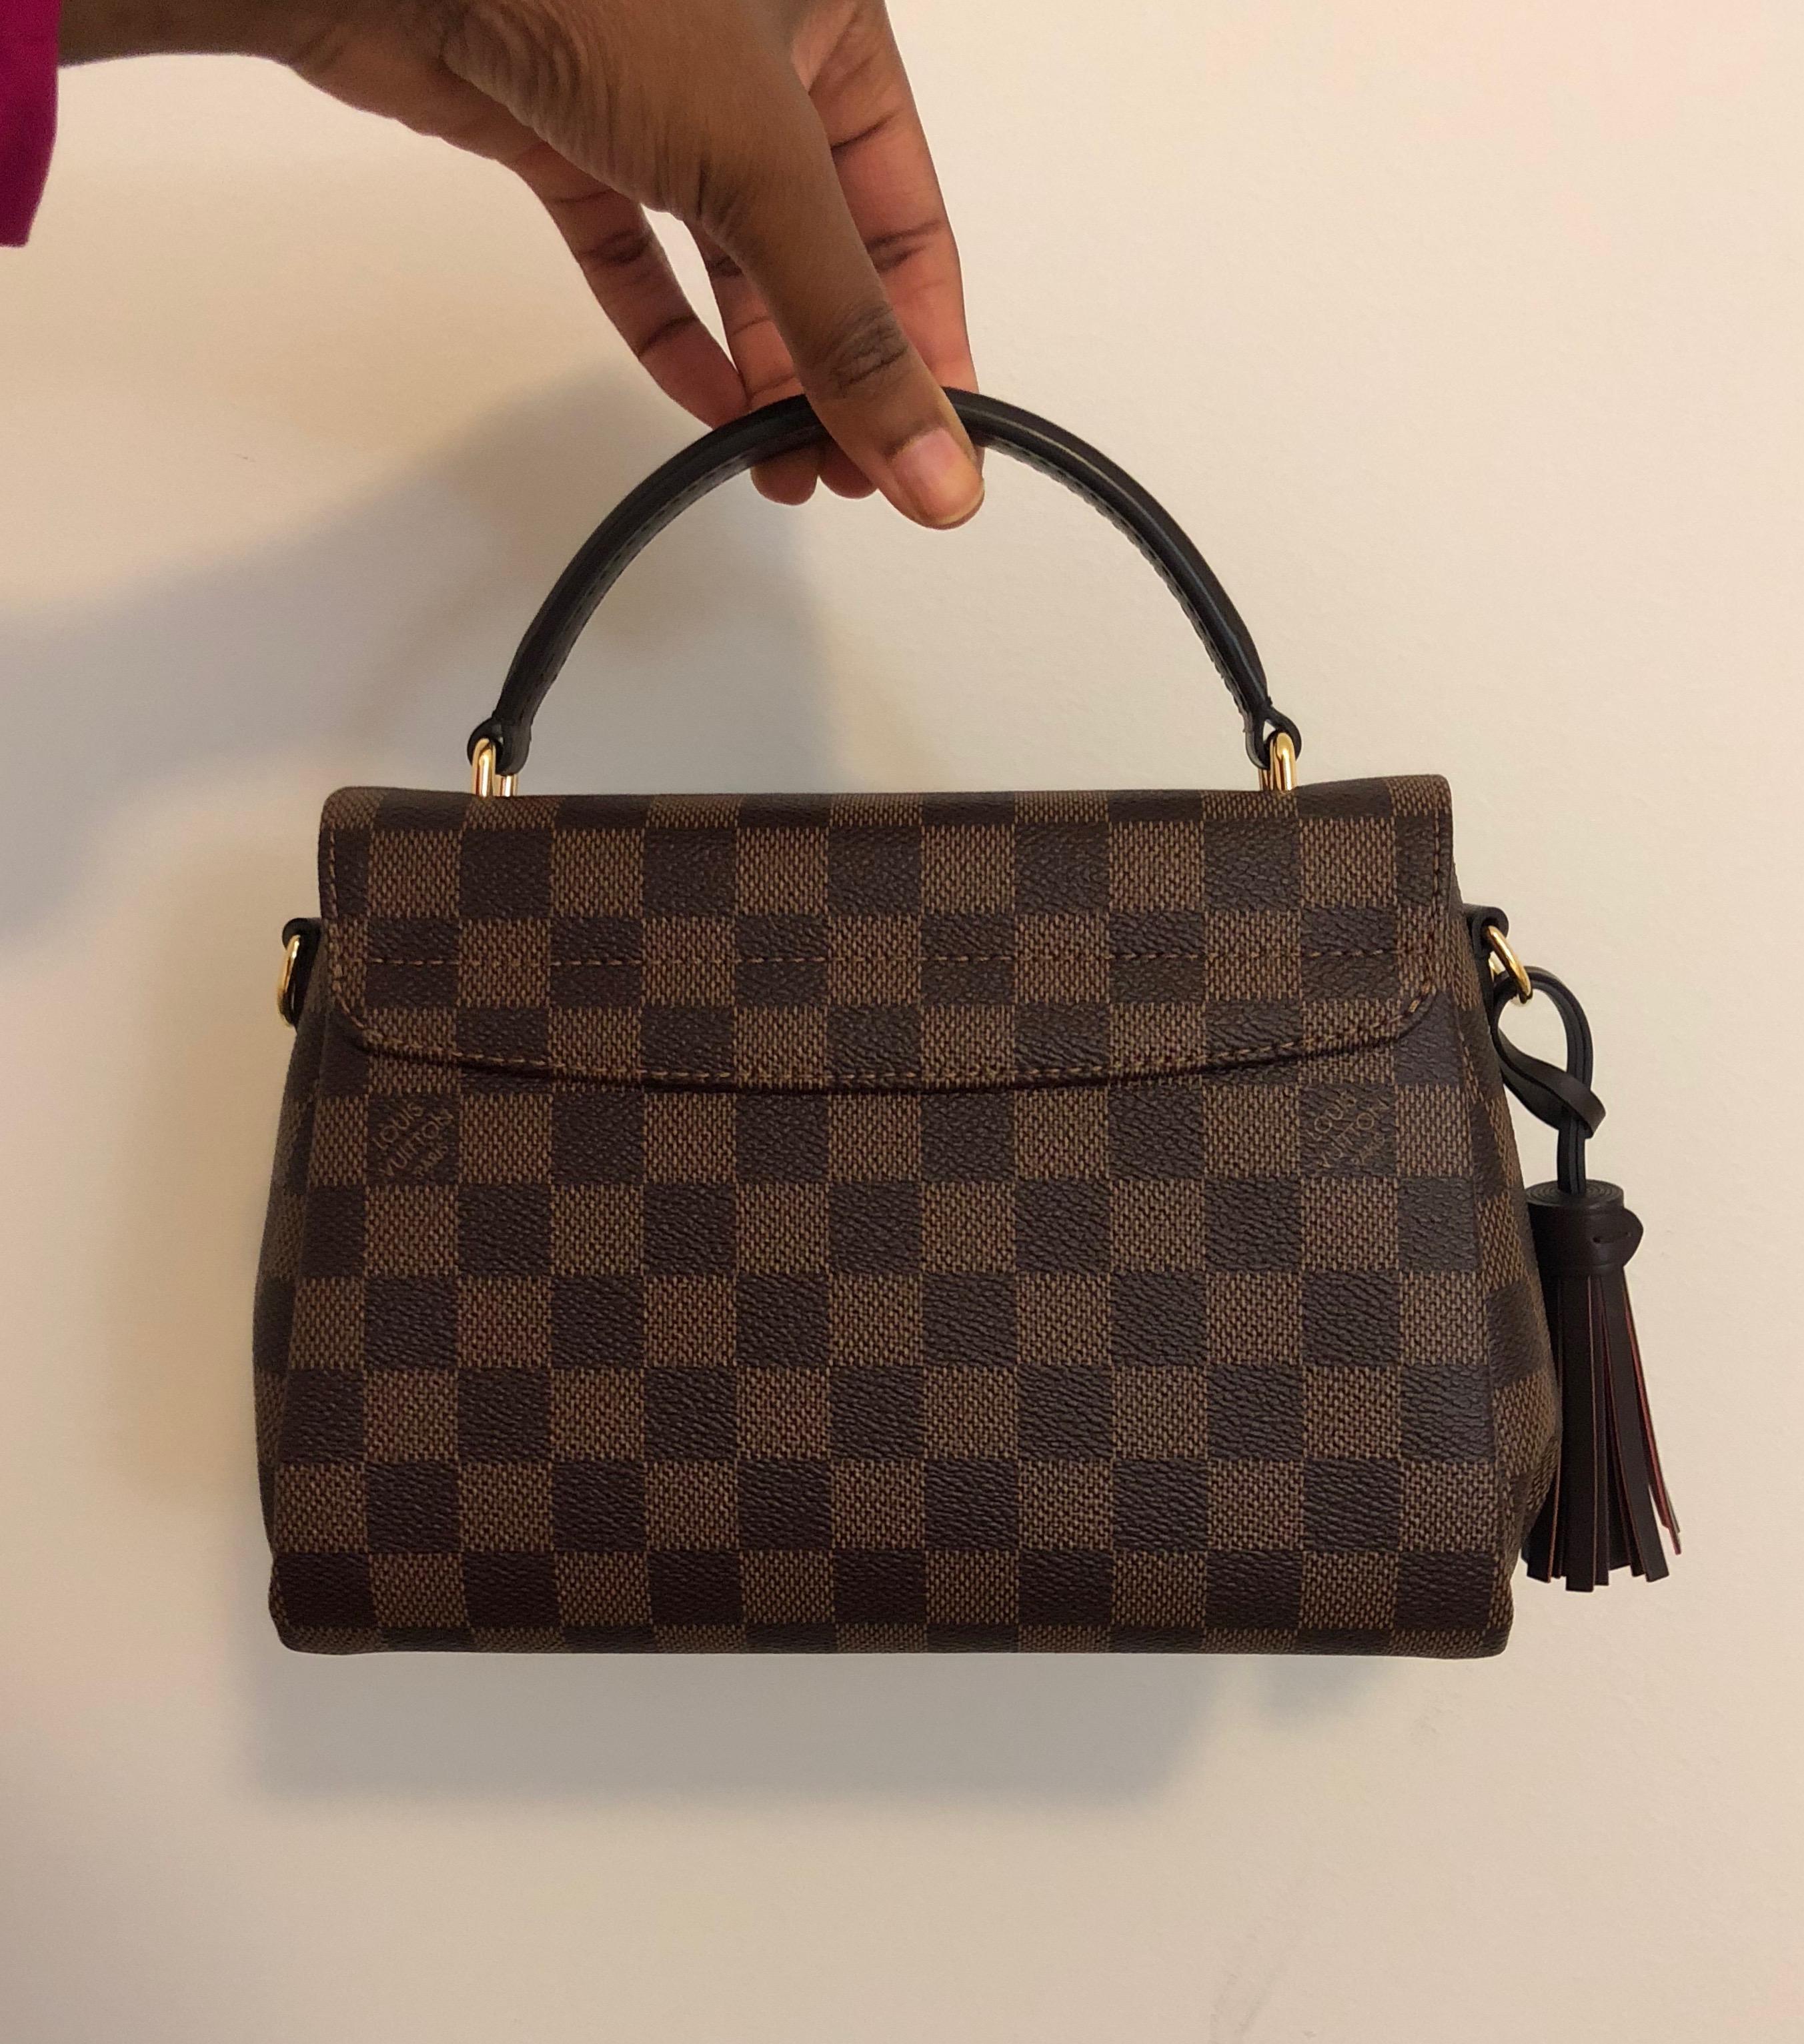 e0c145856976 Louis Vuitton Damier Ebene Croisette – DesignerShare